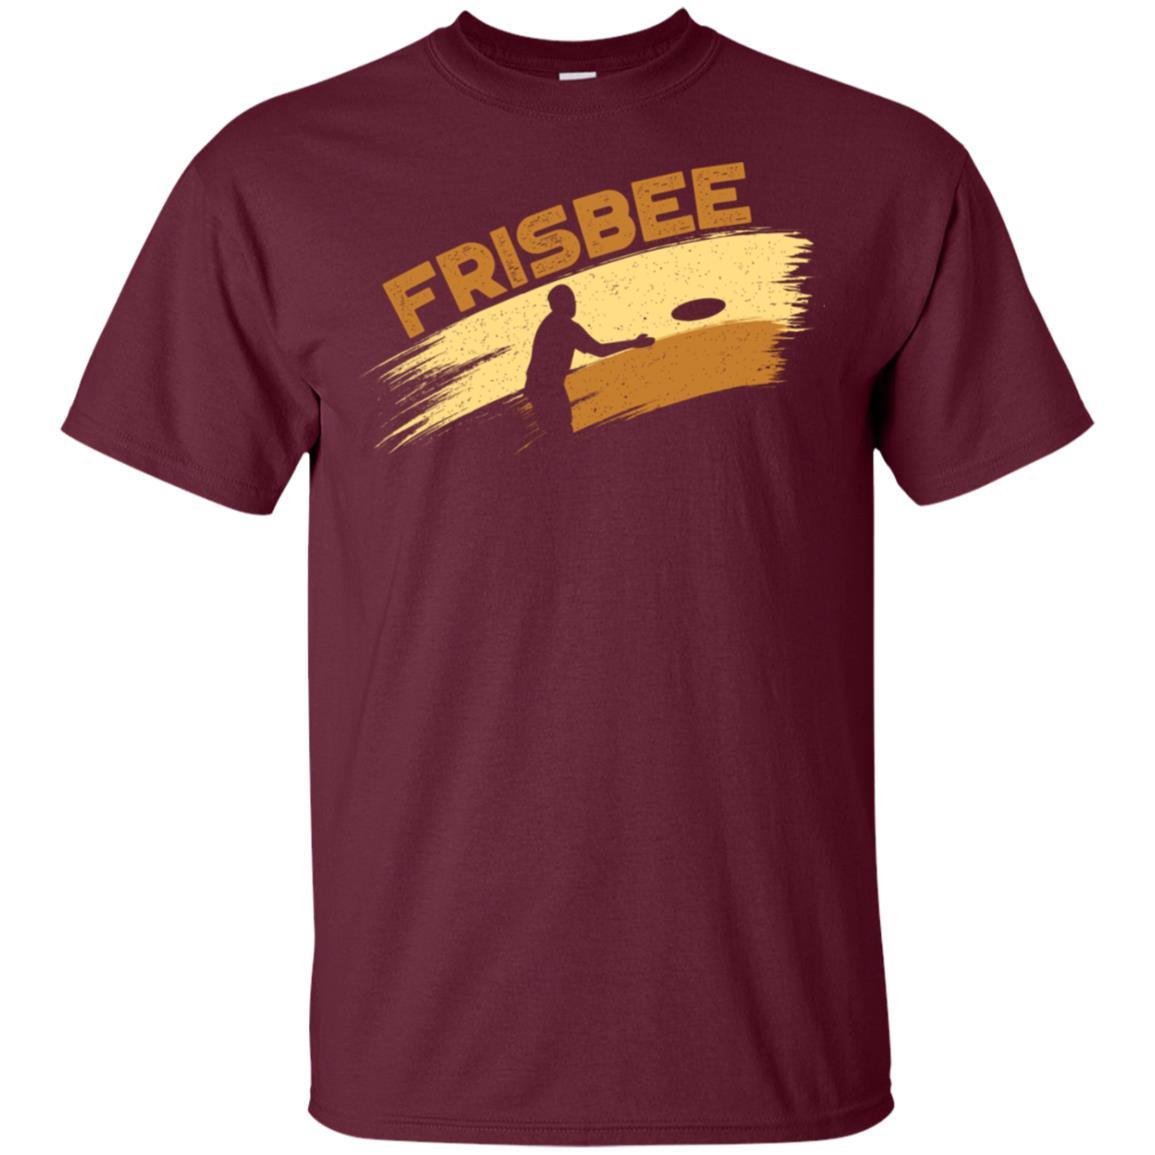 Frisbee Silhouette Unisex Short Sleeve